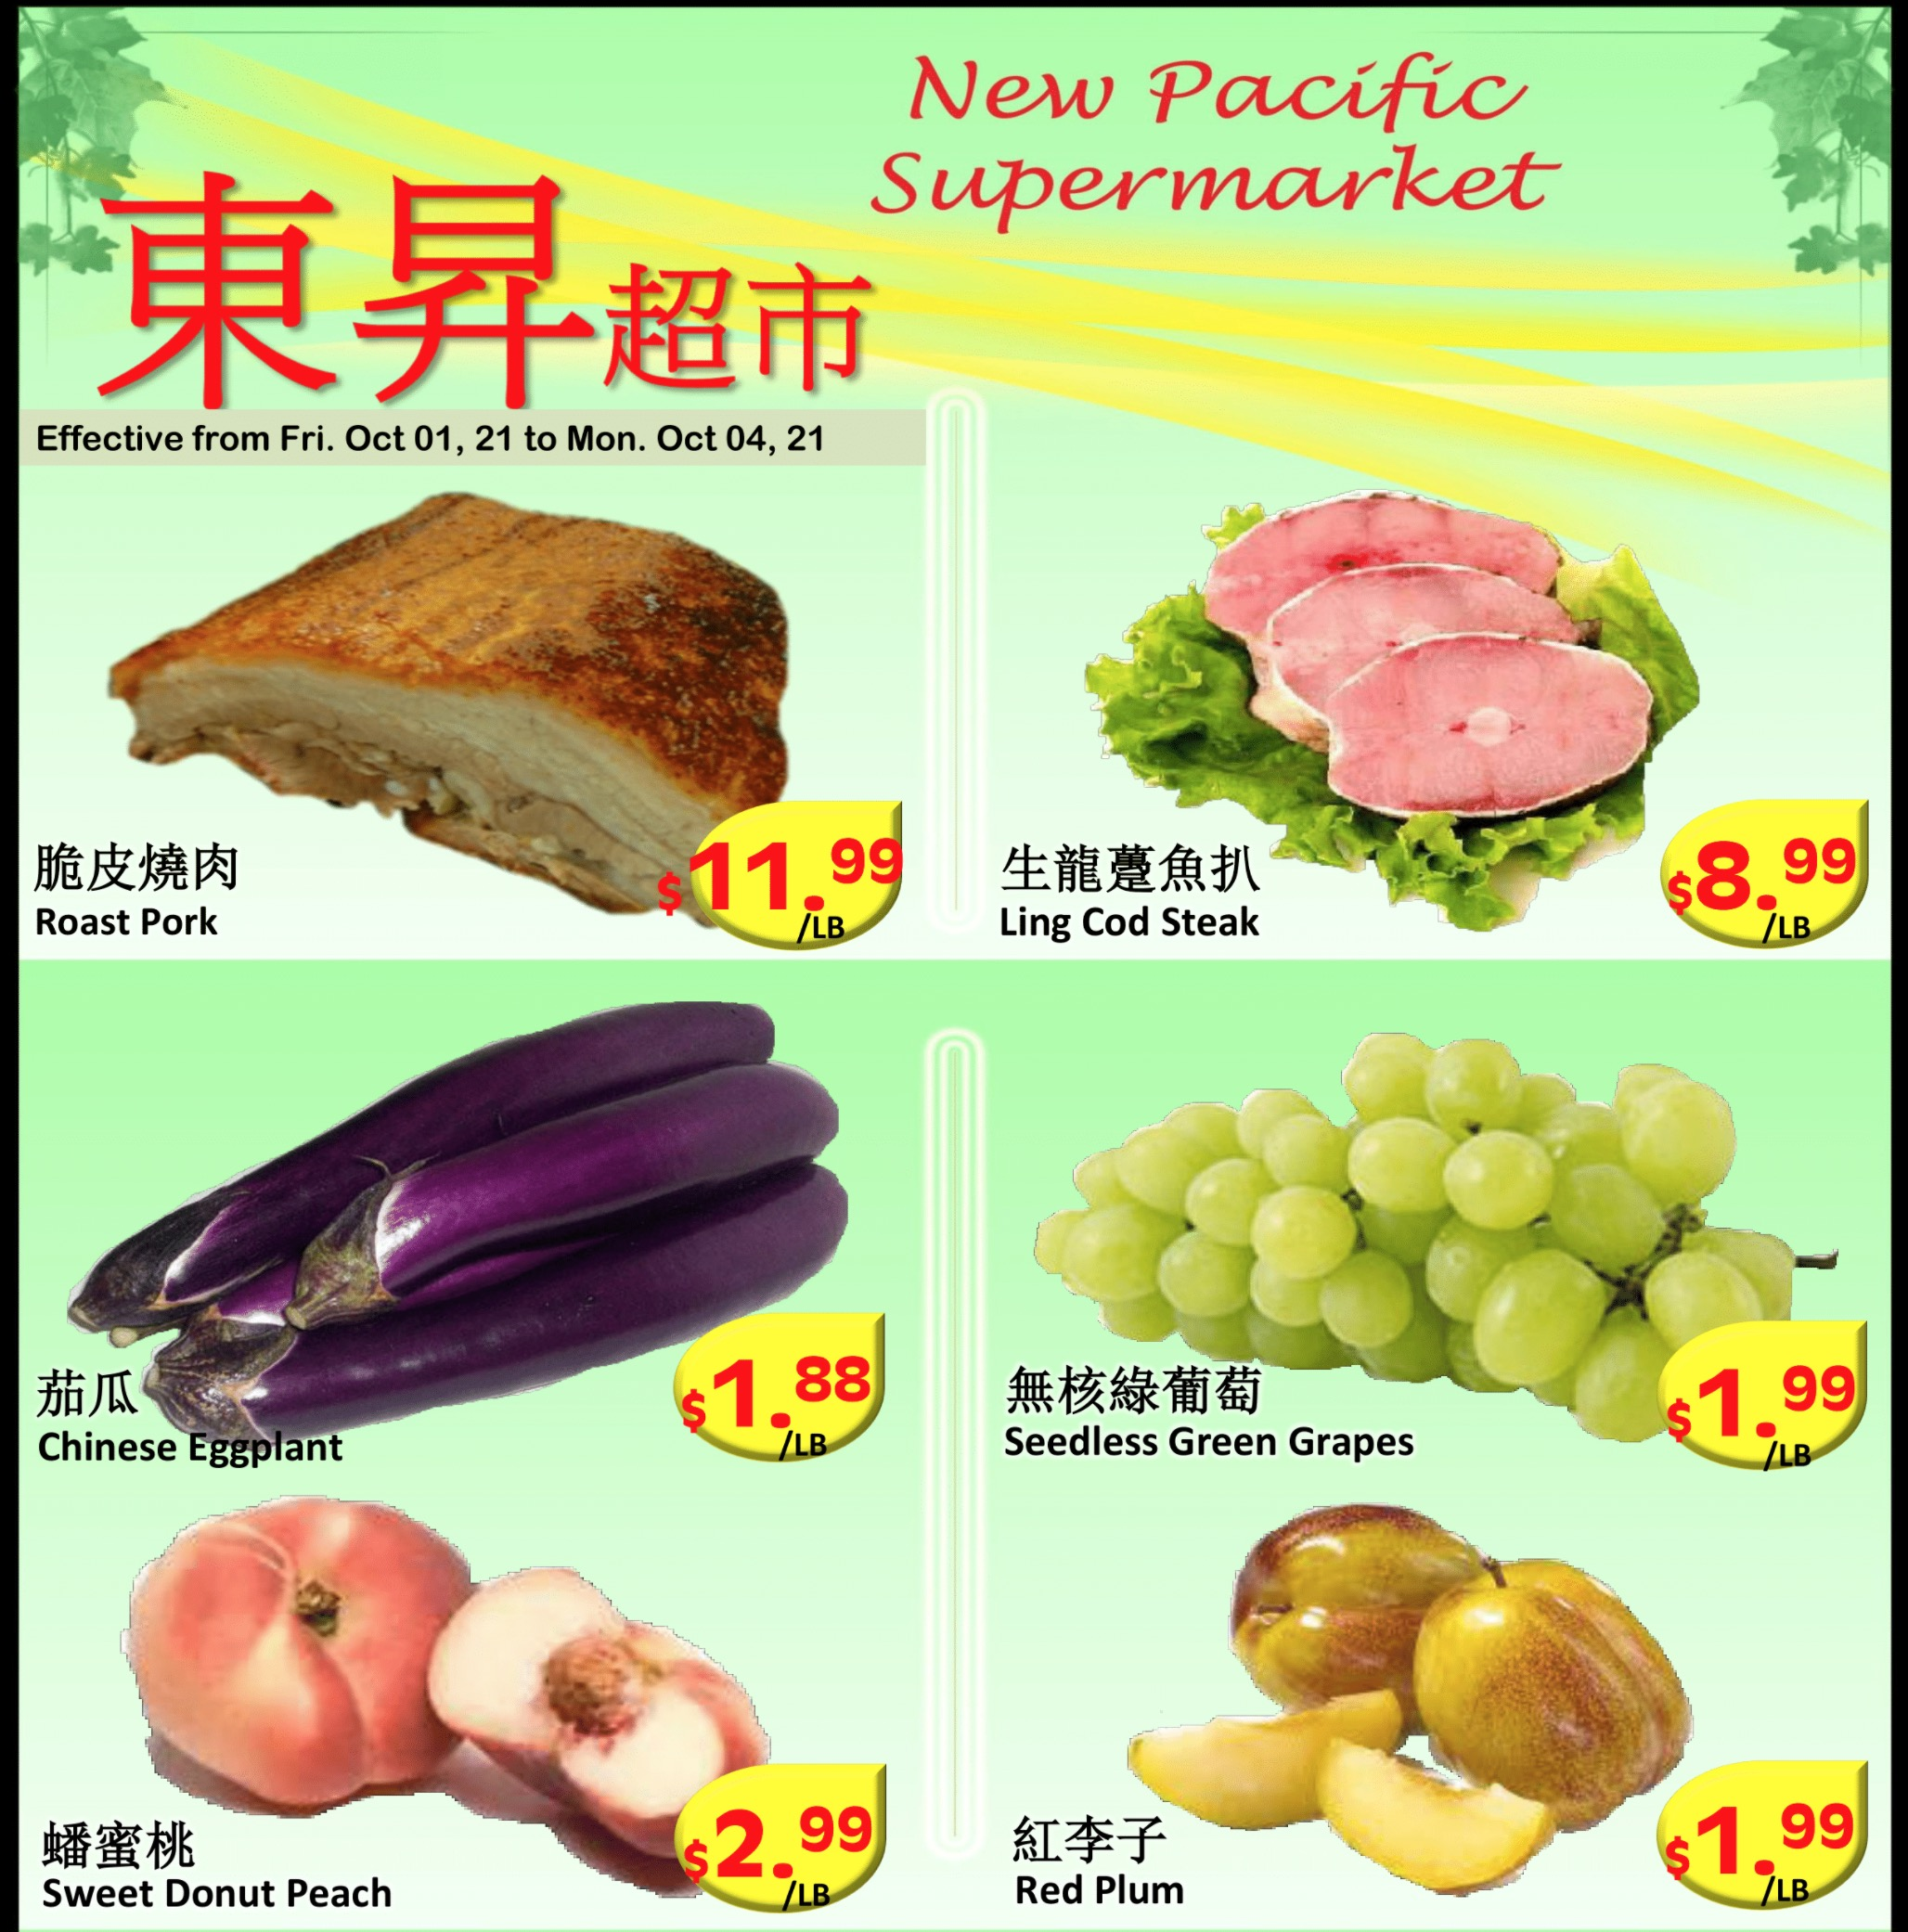 New Pacific Supermarket Flyer   Oct 1